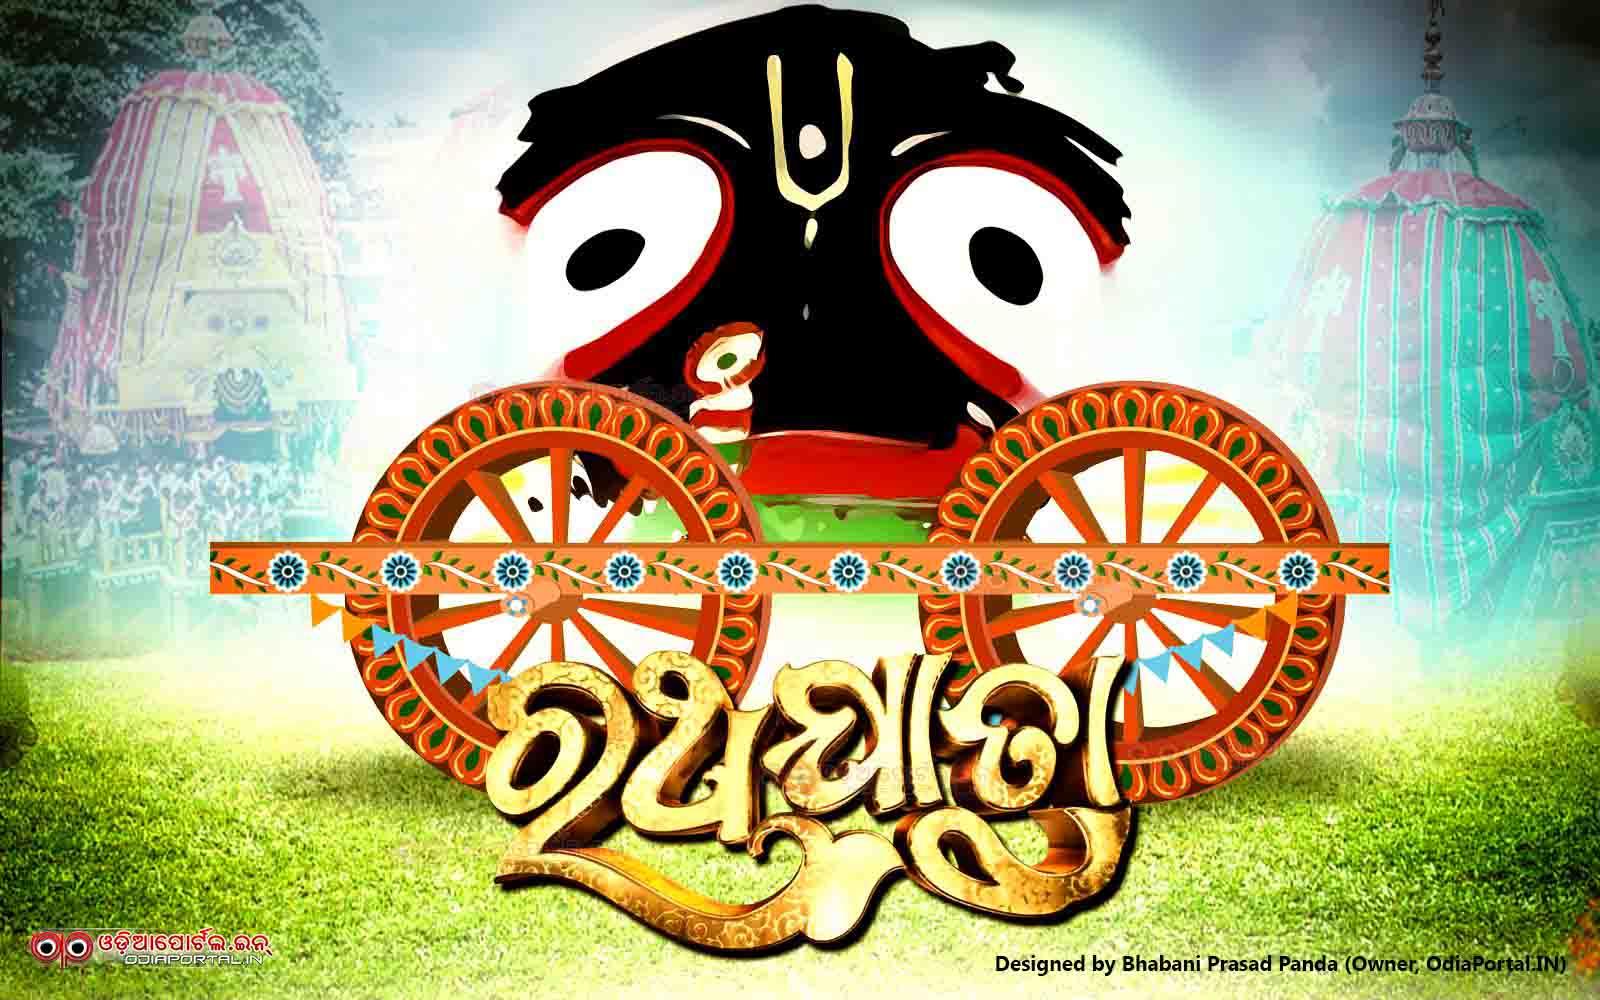 jagannath puri odisha rathyatra wallpaper, Jay jagannath rath yatra car festival, chariot festival hq wallpaper, 3d wallpaper, hd, designed by bhabani prasad panda